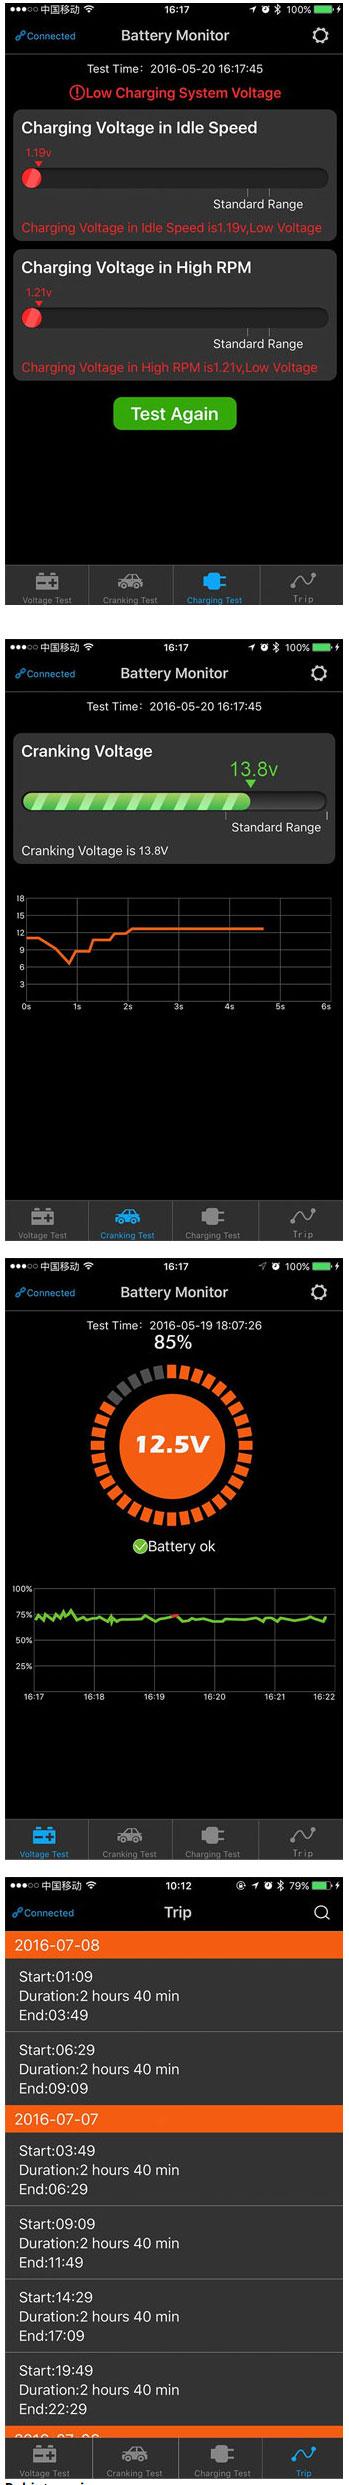 BM2 bezprzewodowy miernik napięcia z komunikacją Bluetooth BTE-902 akumulatora 12V